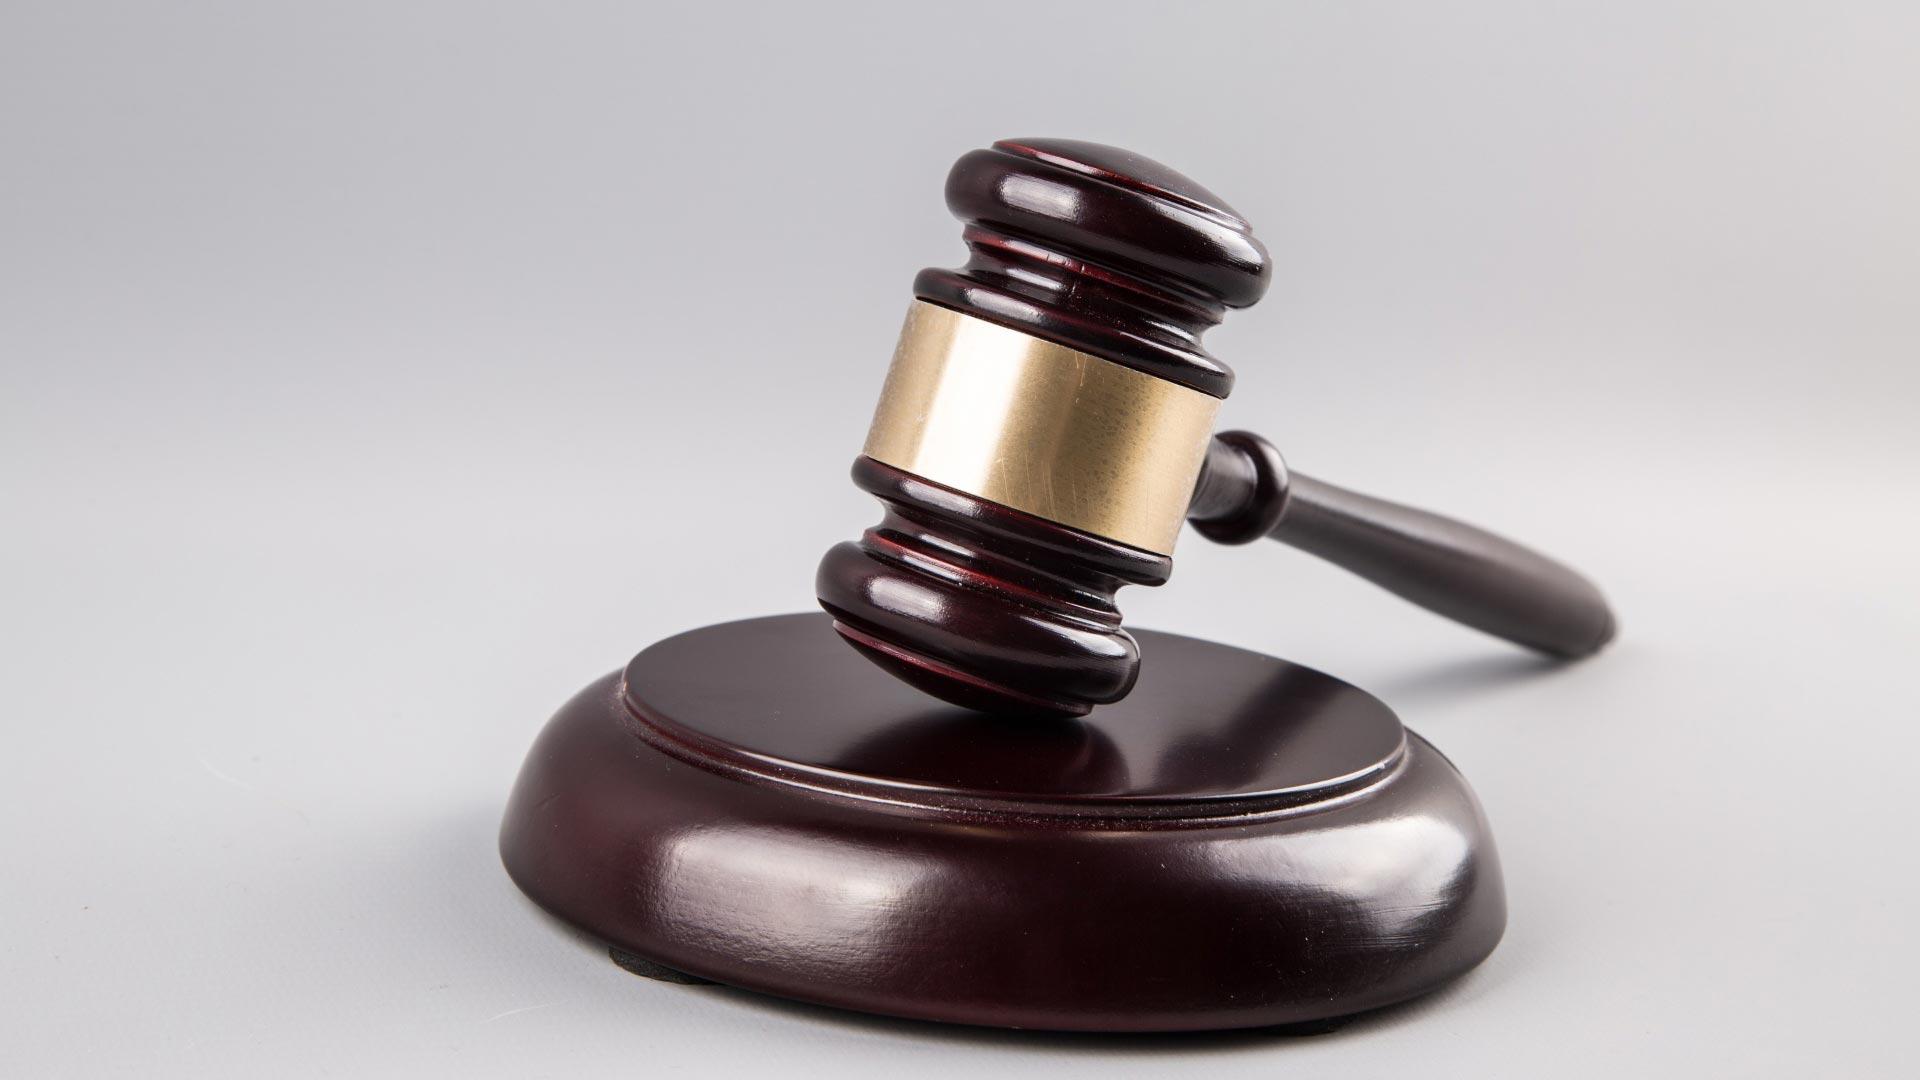 Four hotels, shops fined in Moulvibazar